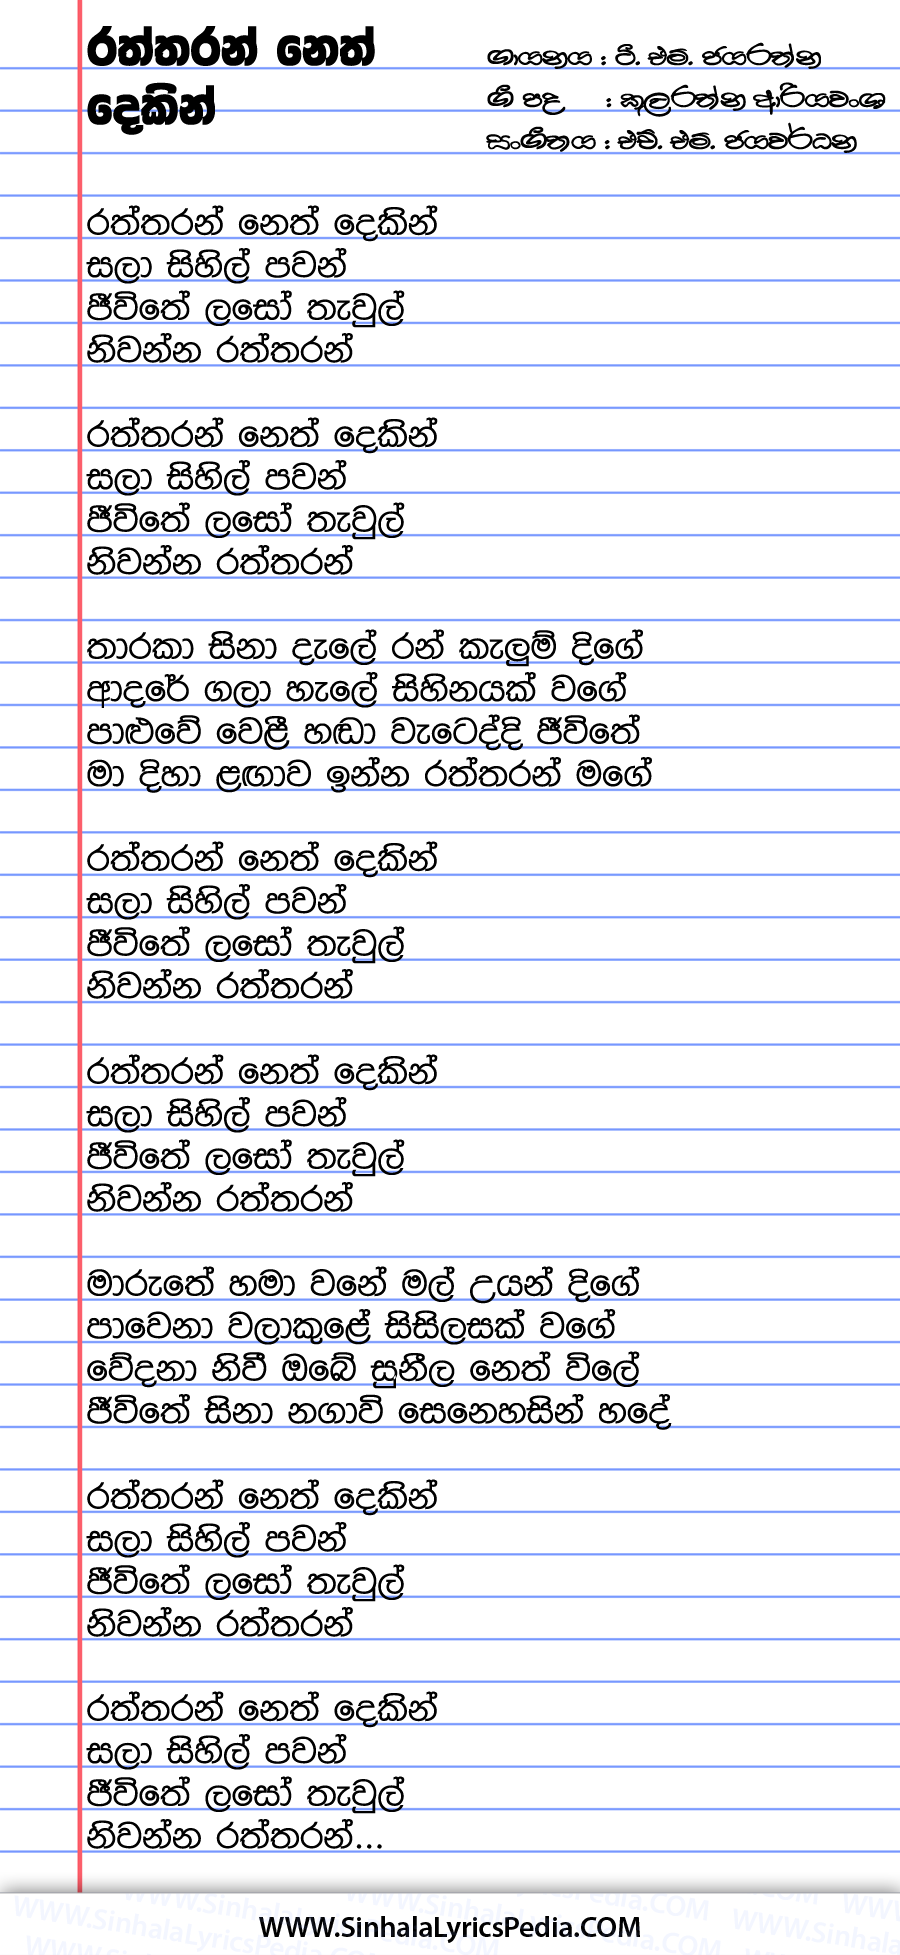 Raththaran Neth Dekin Song Lyrics